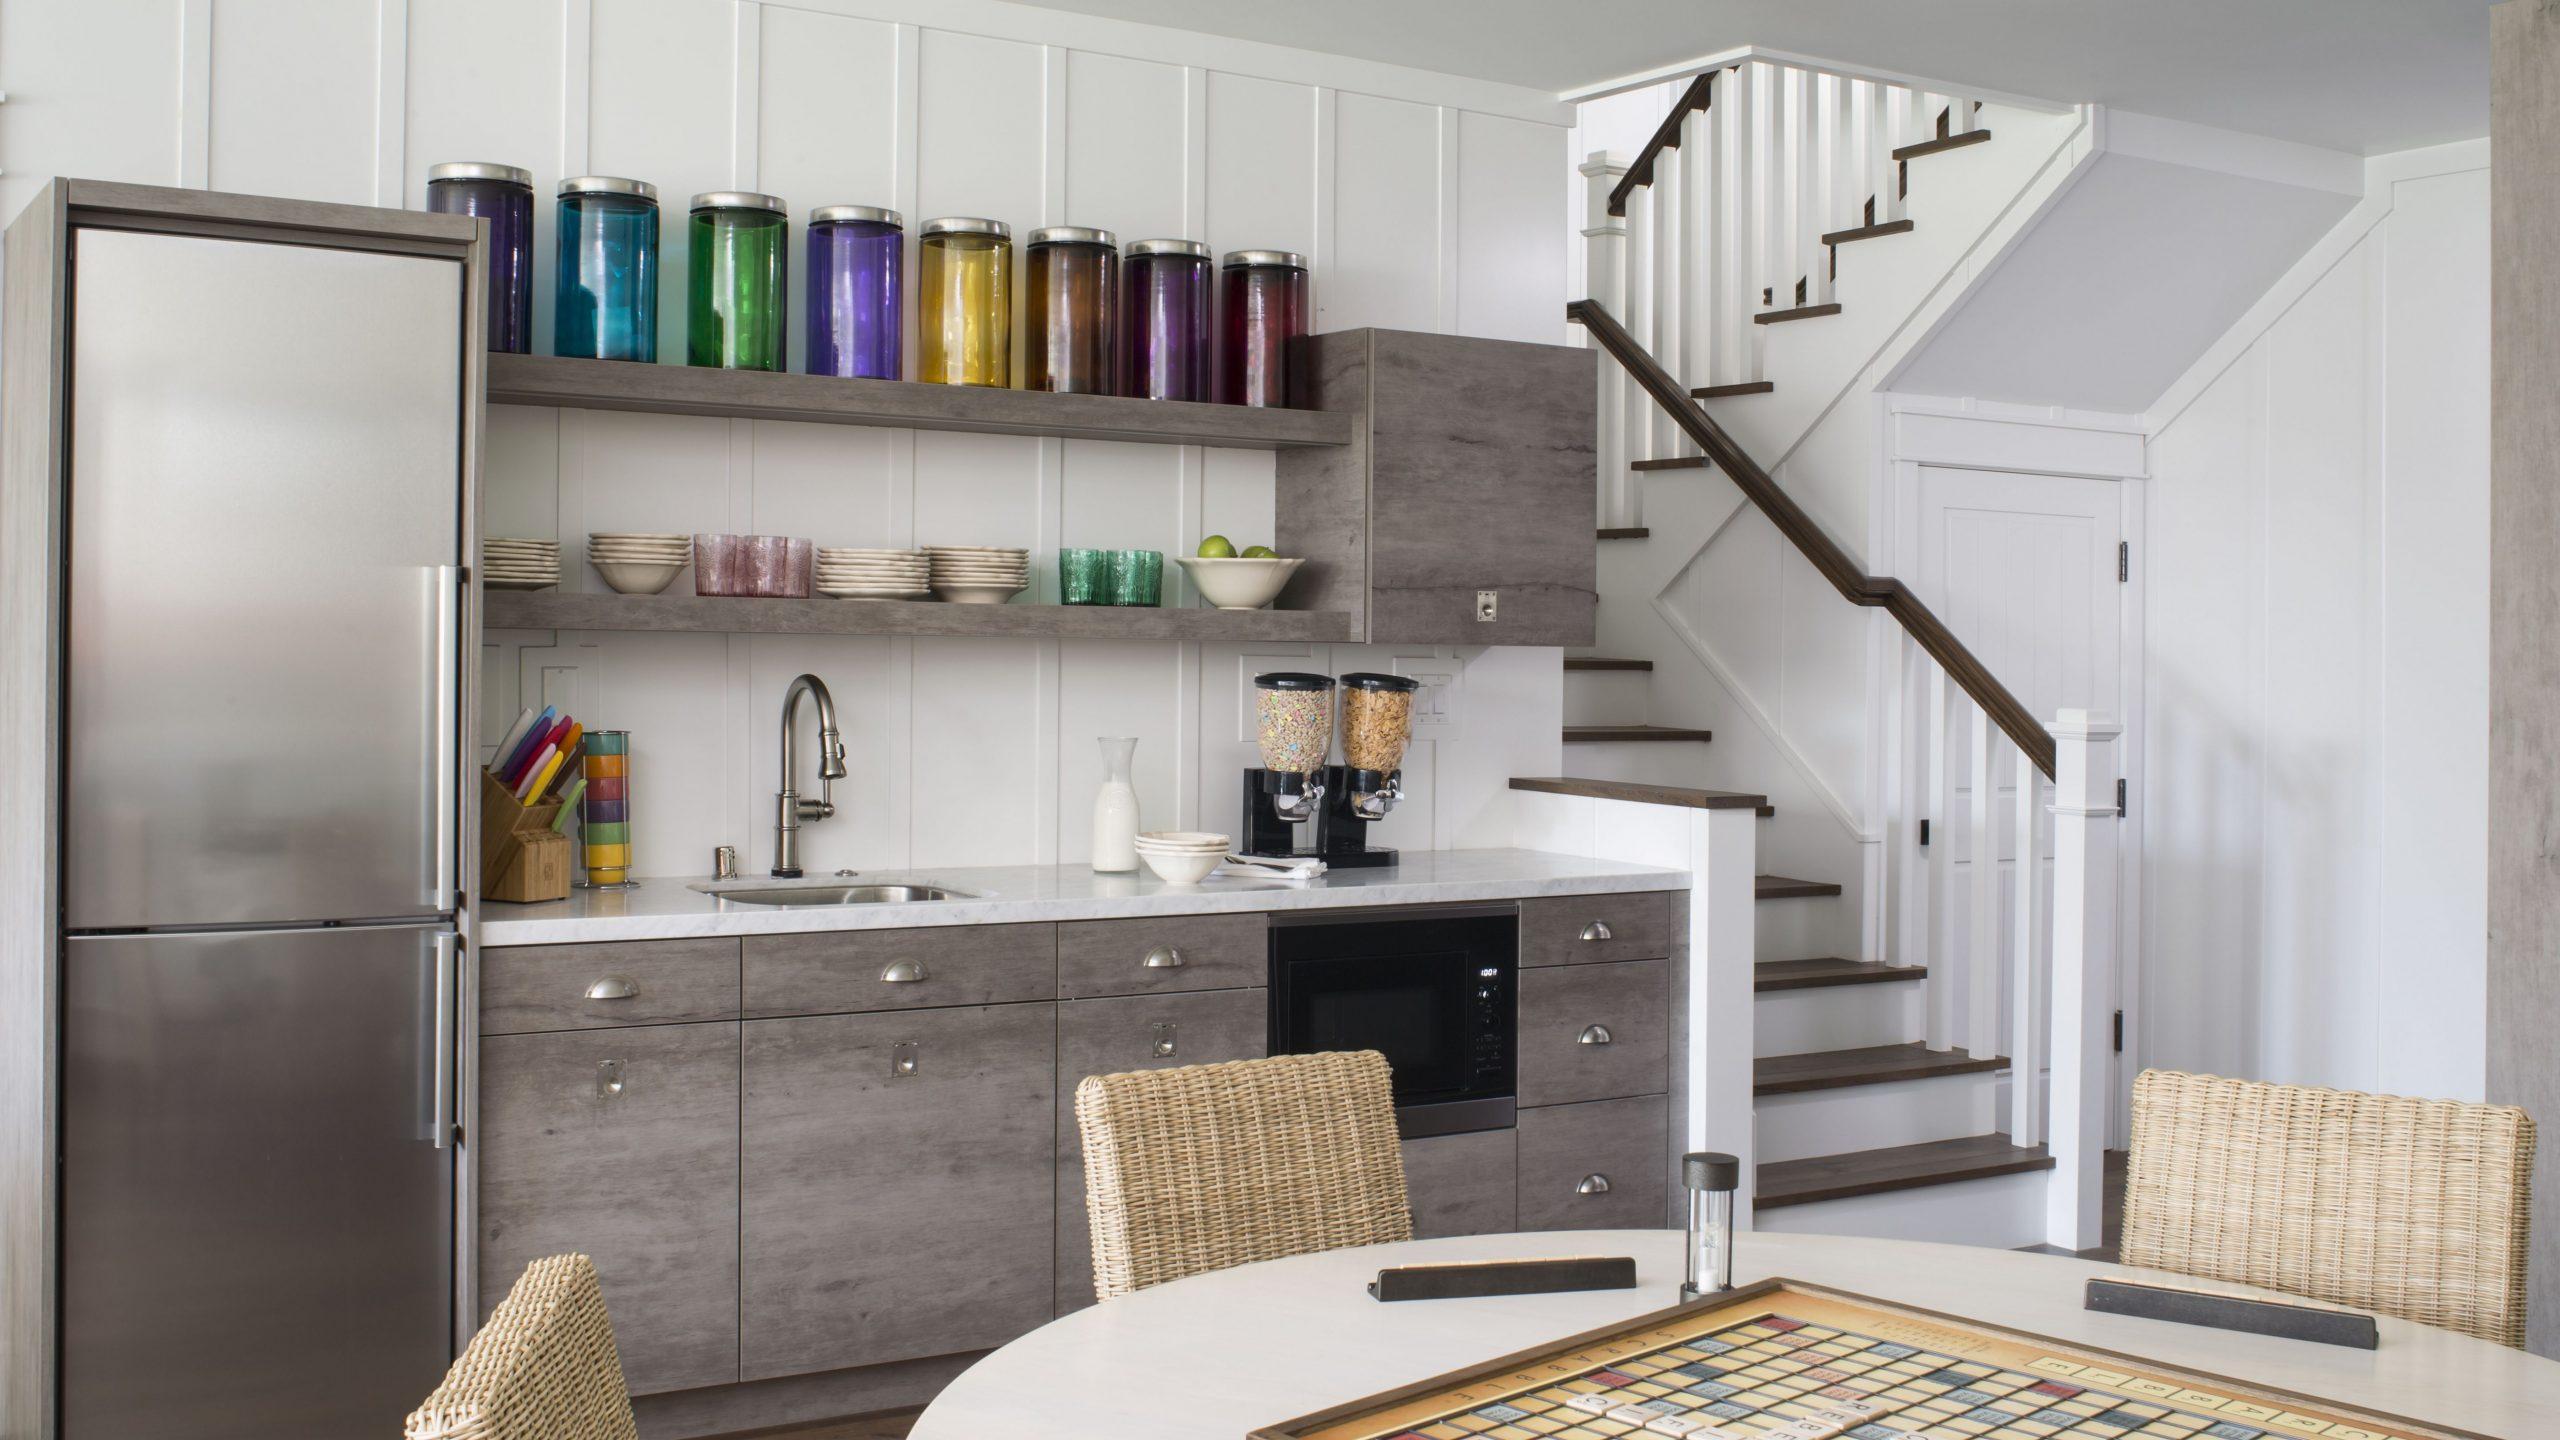 Basement Kitchenette Ideas - Bedroom Kitchenette Ideas